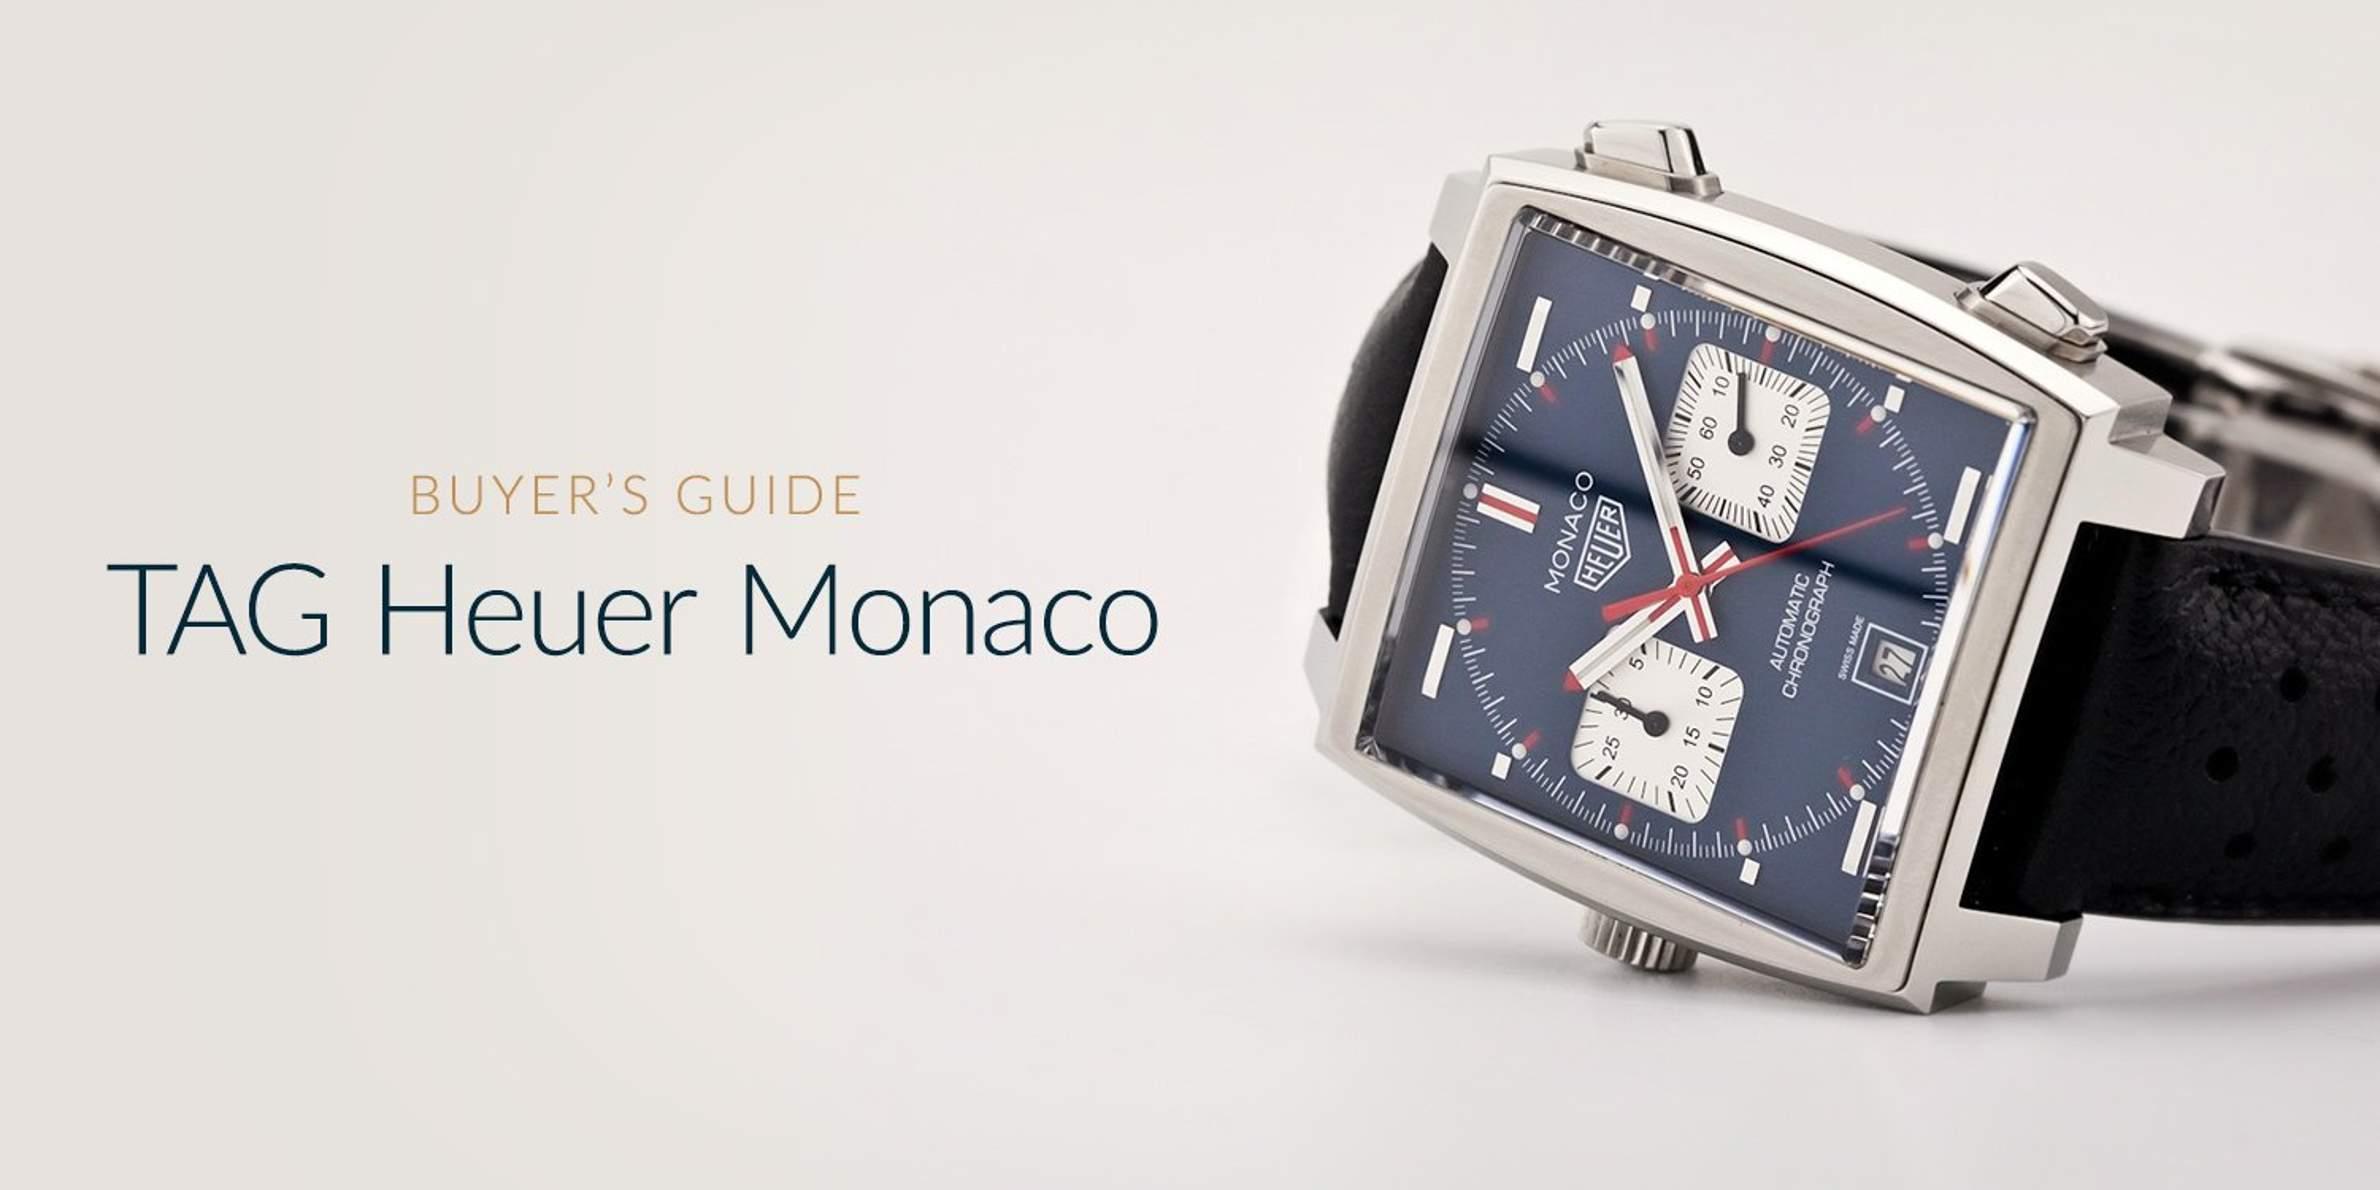 Chrono24 Buyer's Guide: TAG Heuer Monaco